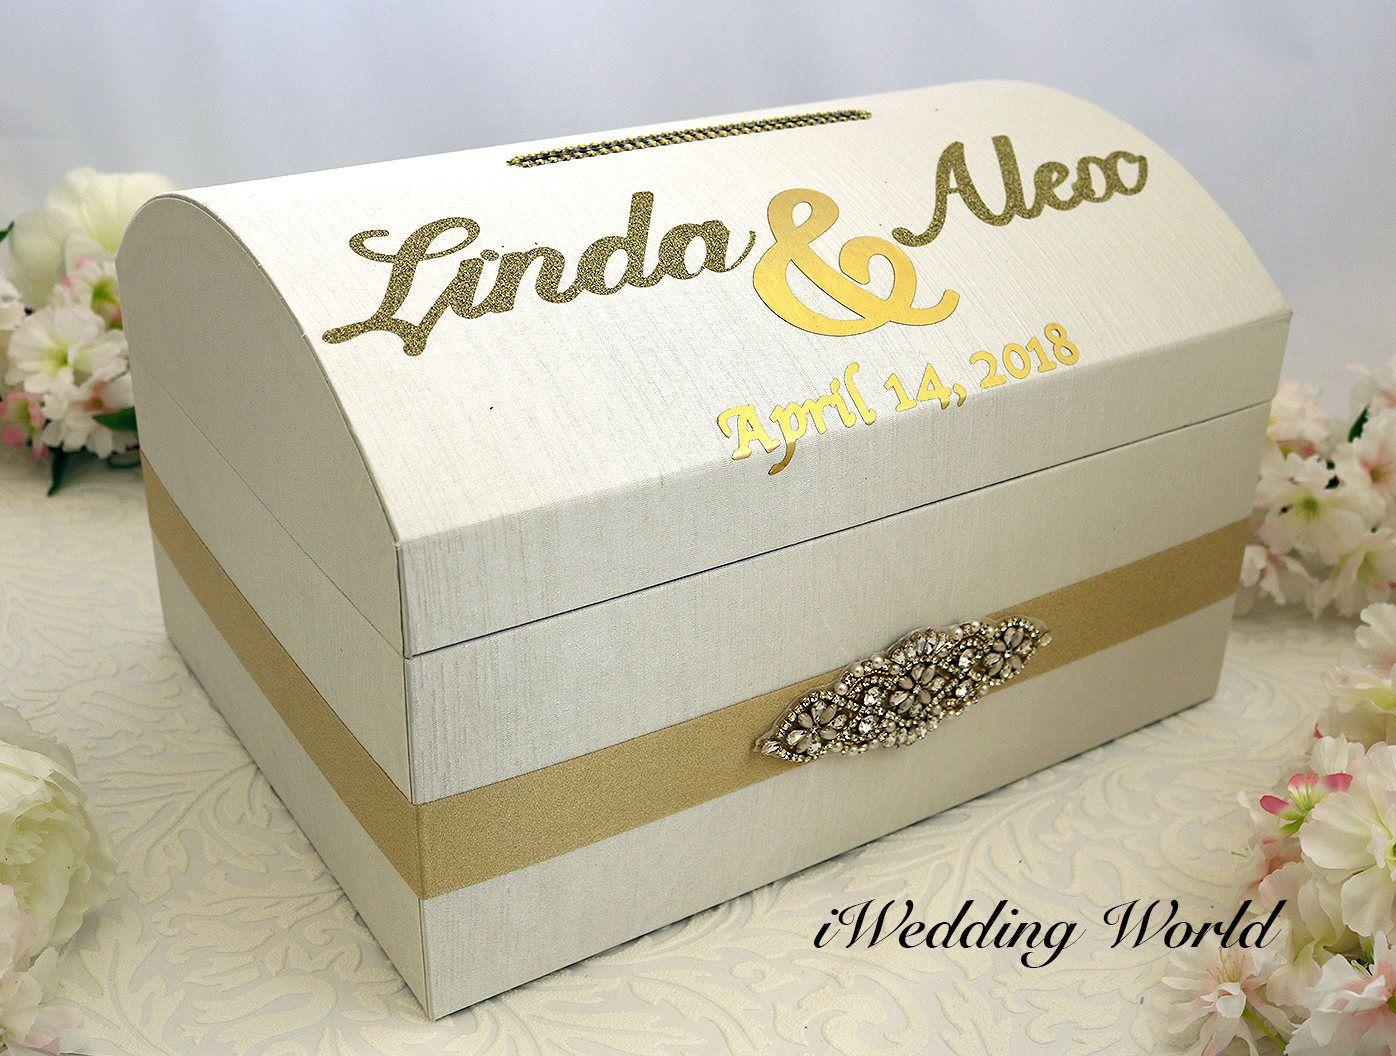 Personalized Wedding Card Box, Wedding Card Holder, Custom Gift Box ...